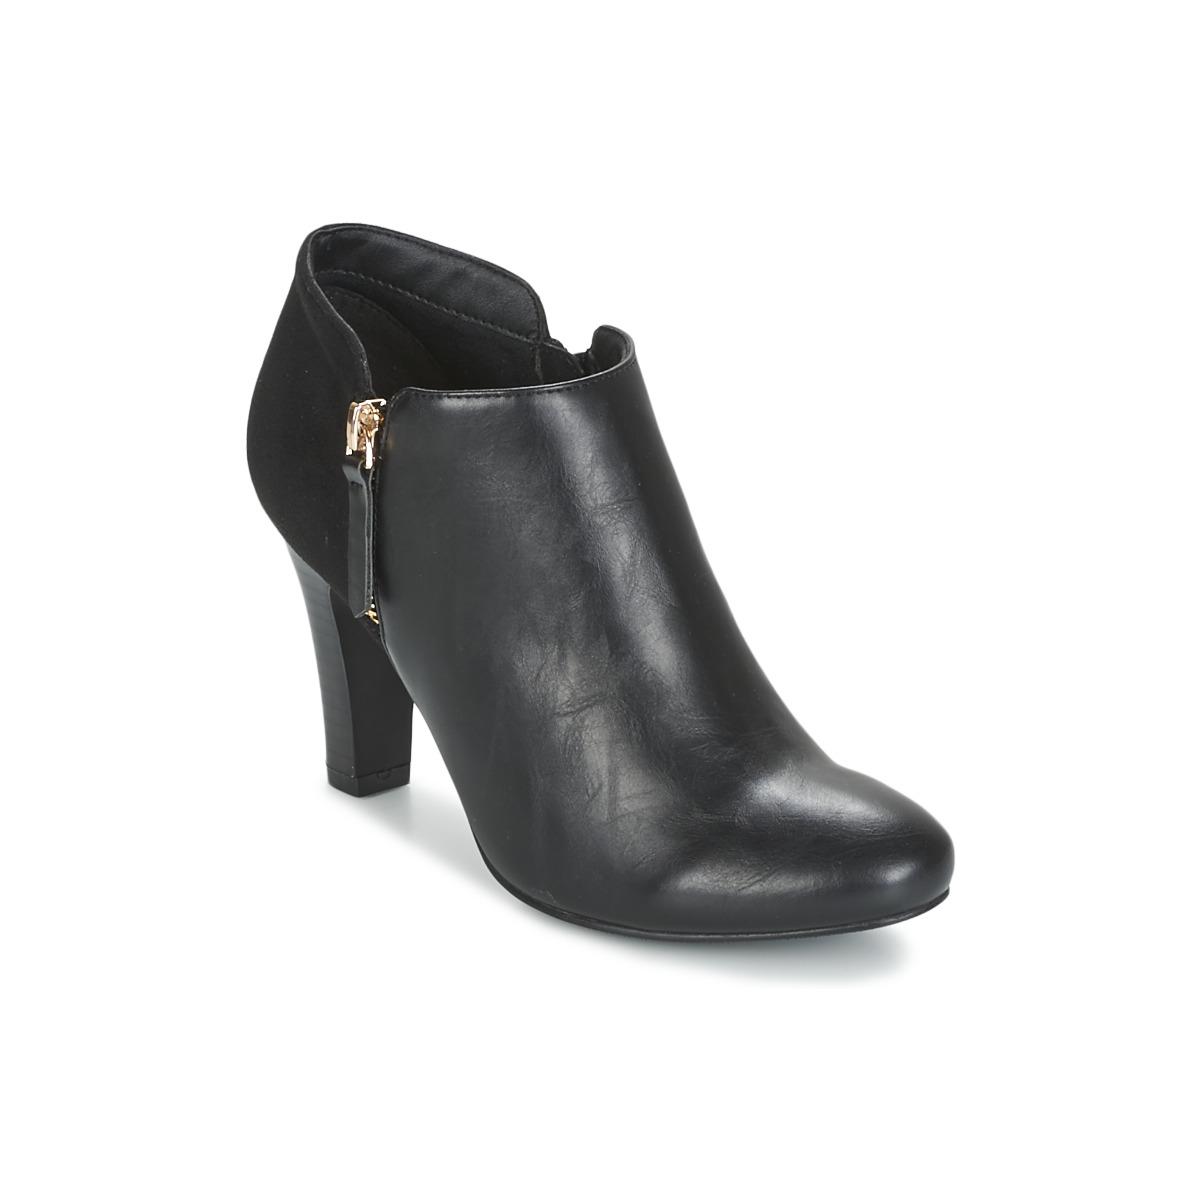 Moony Mood FADI Schwarz - Kostenloser Versand bei Spartoode ! - Schuhe Ankle Boots Damen 49,99 €